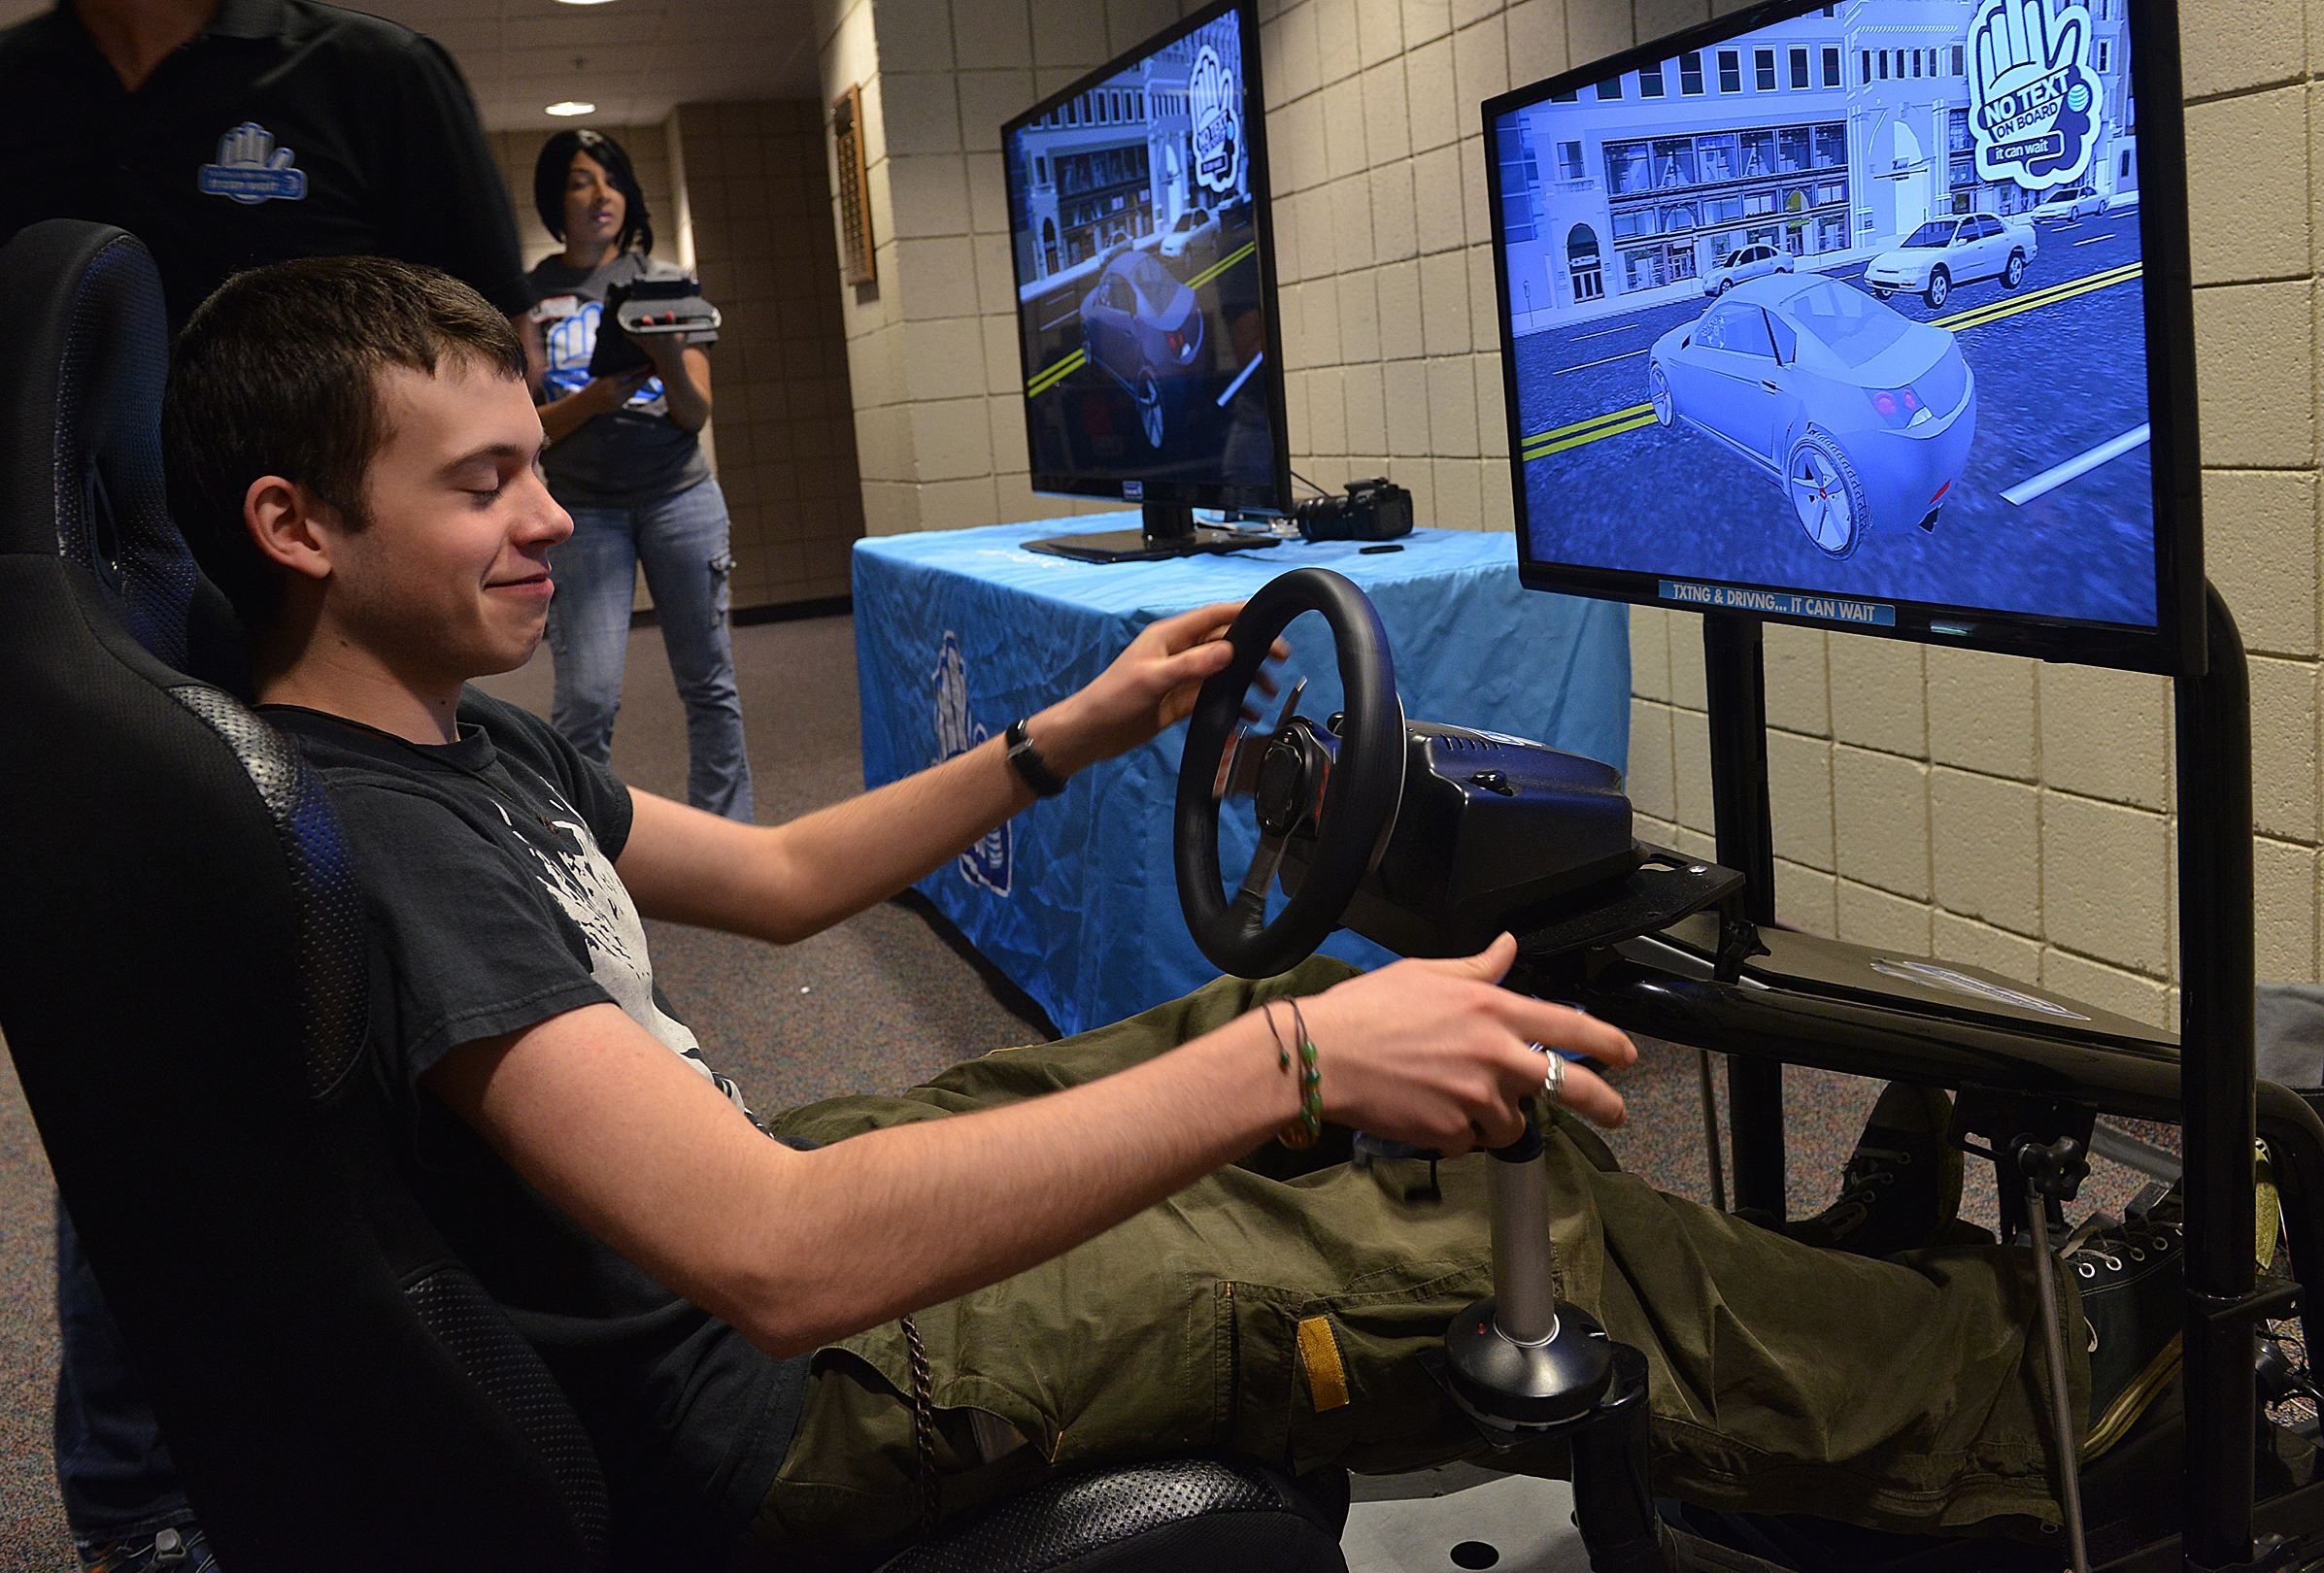 Old Driving Simulator Lrtextdrivelocal